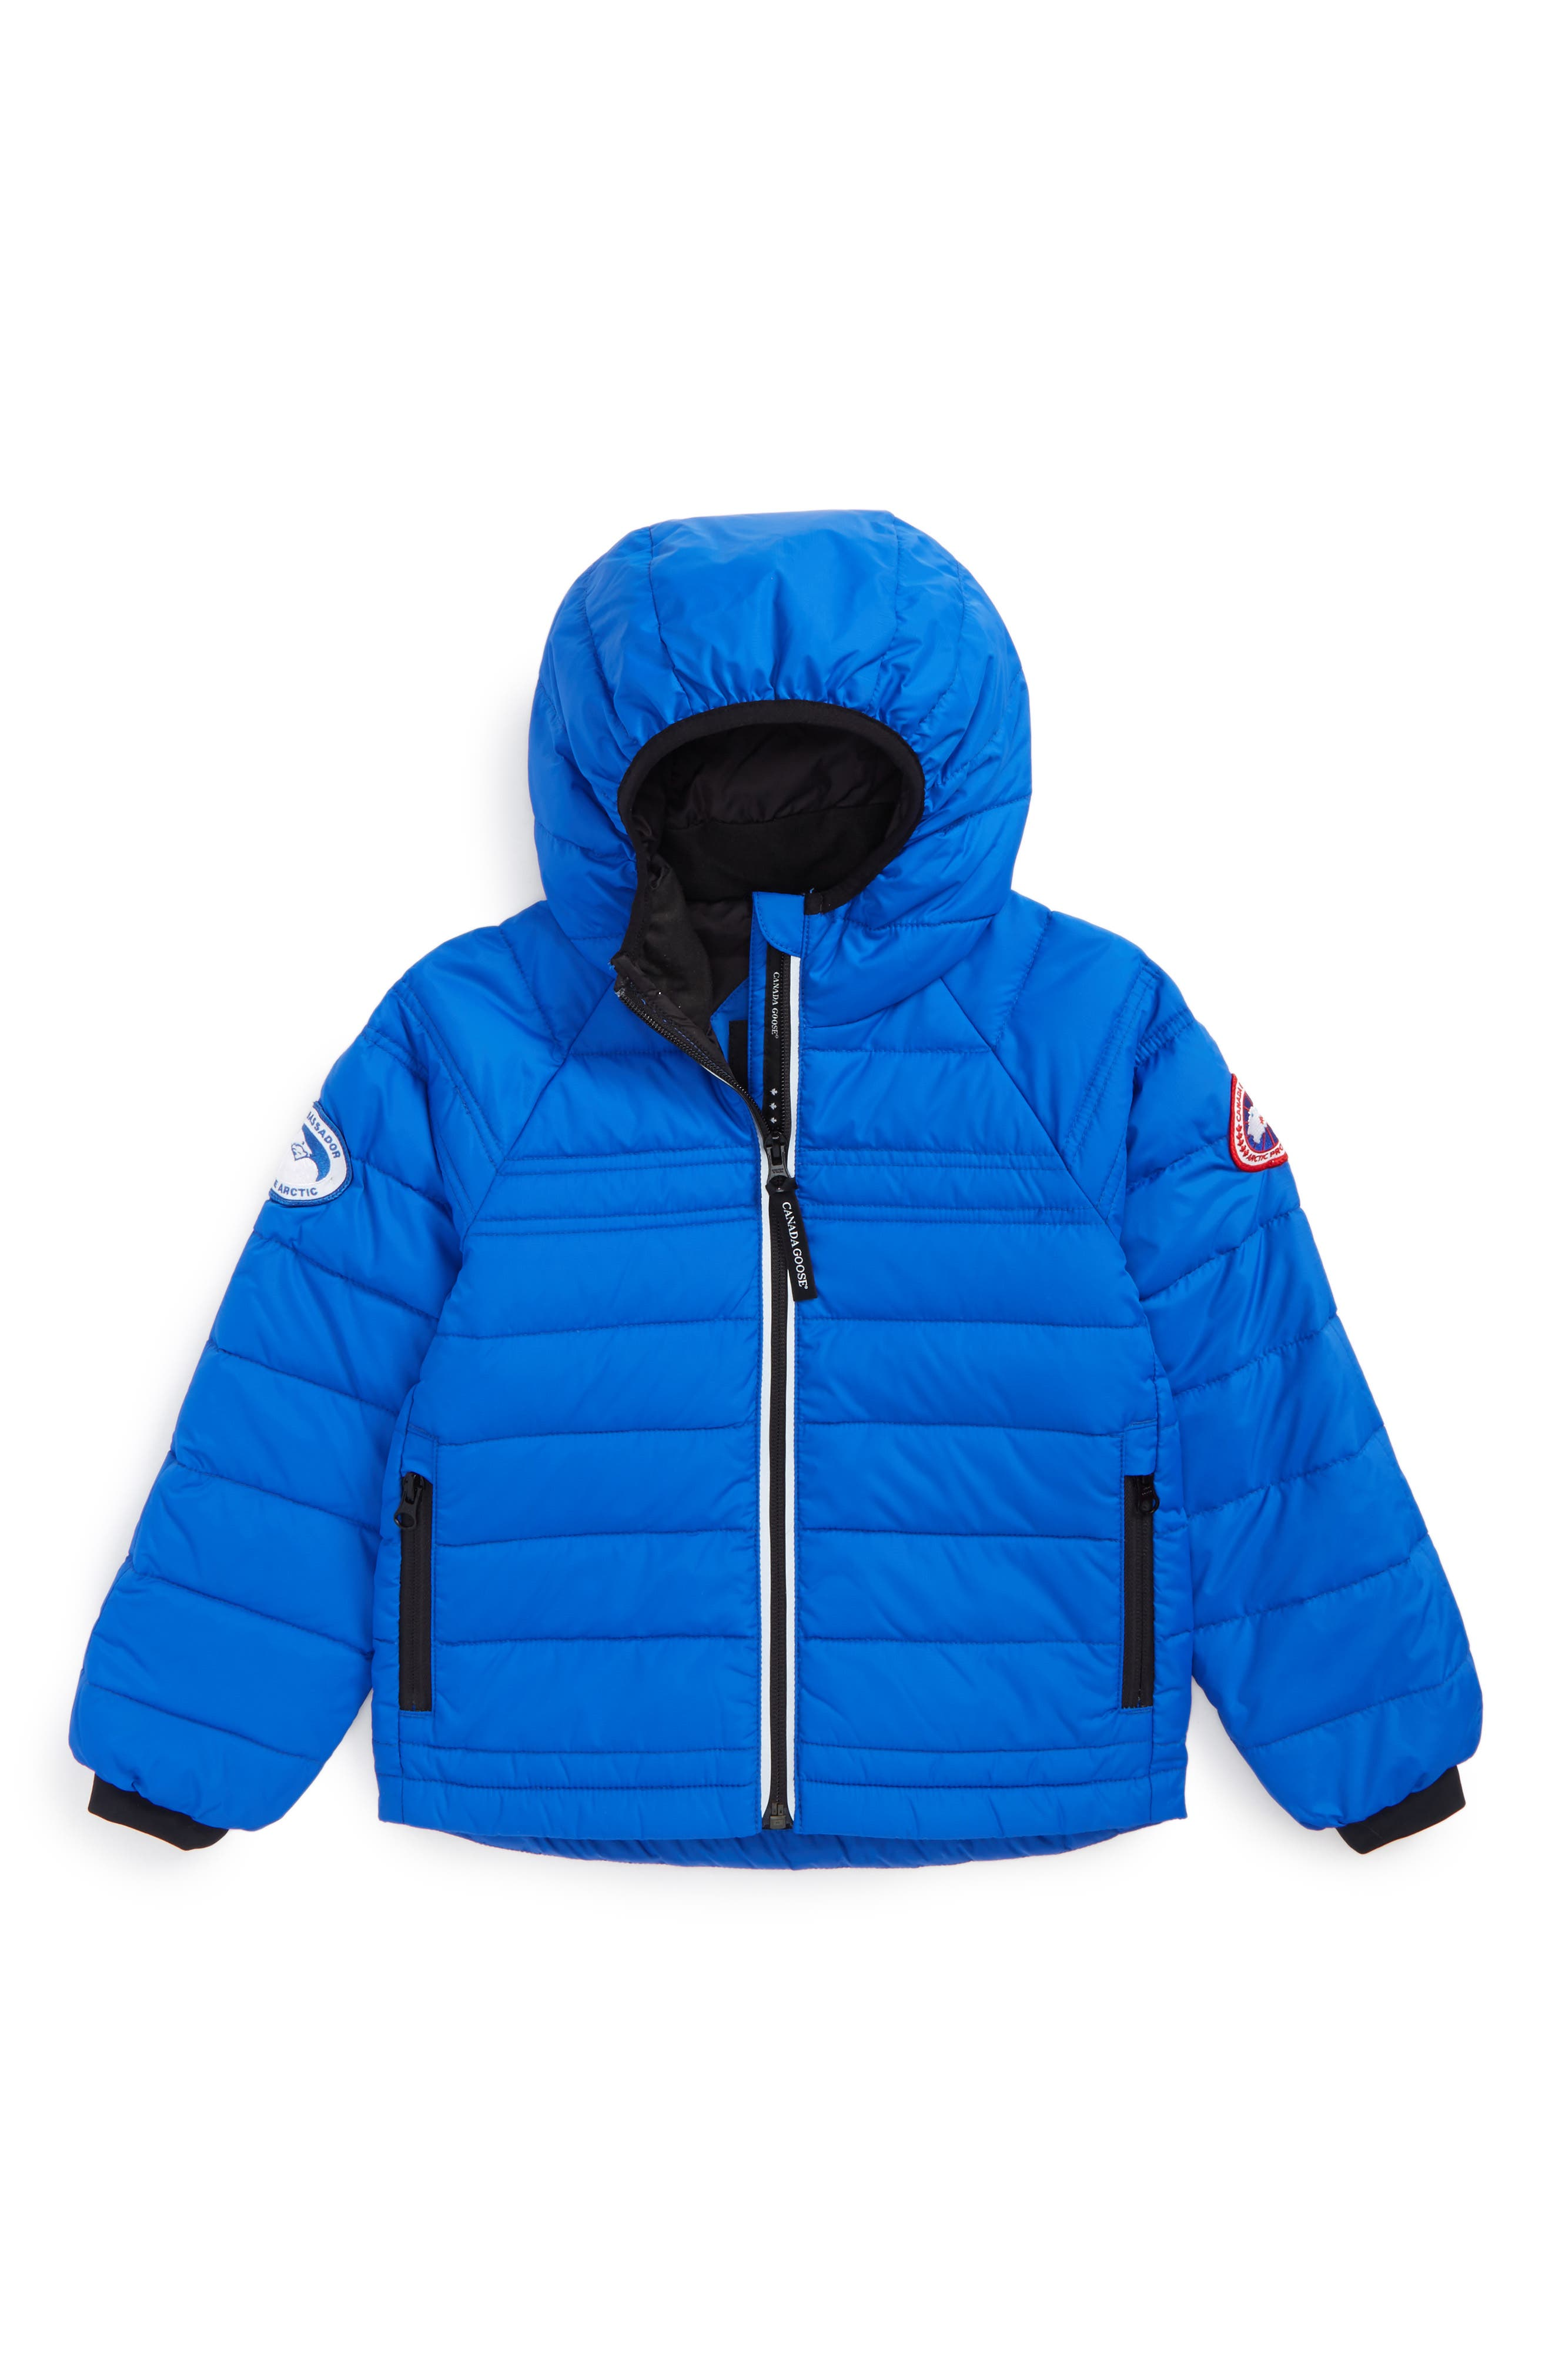 CANADA GOOSE, Bobcat Water Resistant Hooded Down Jacket, Main thumbnail 1, color, PBI BLUE